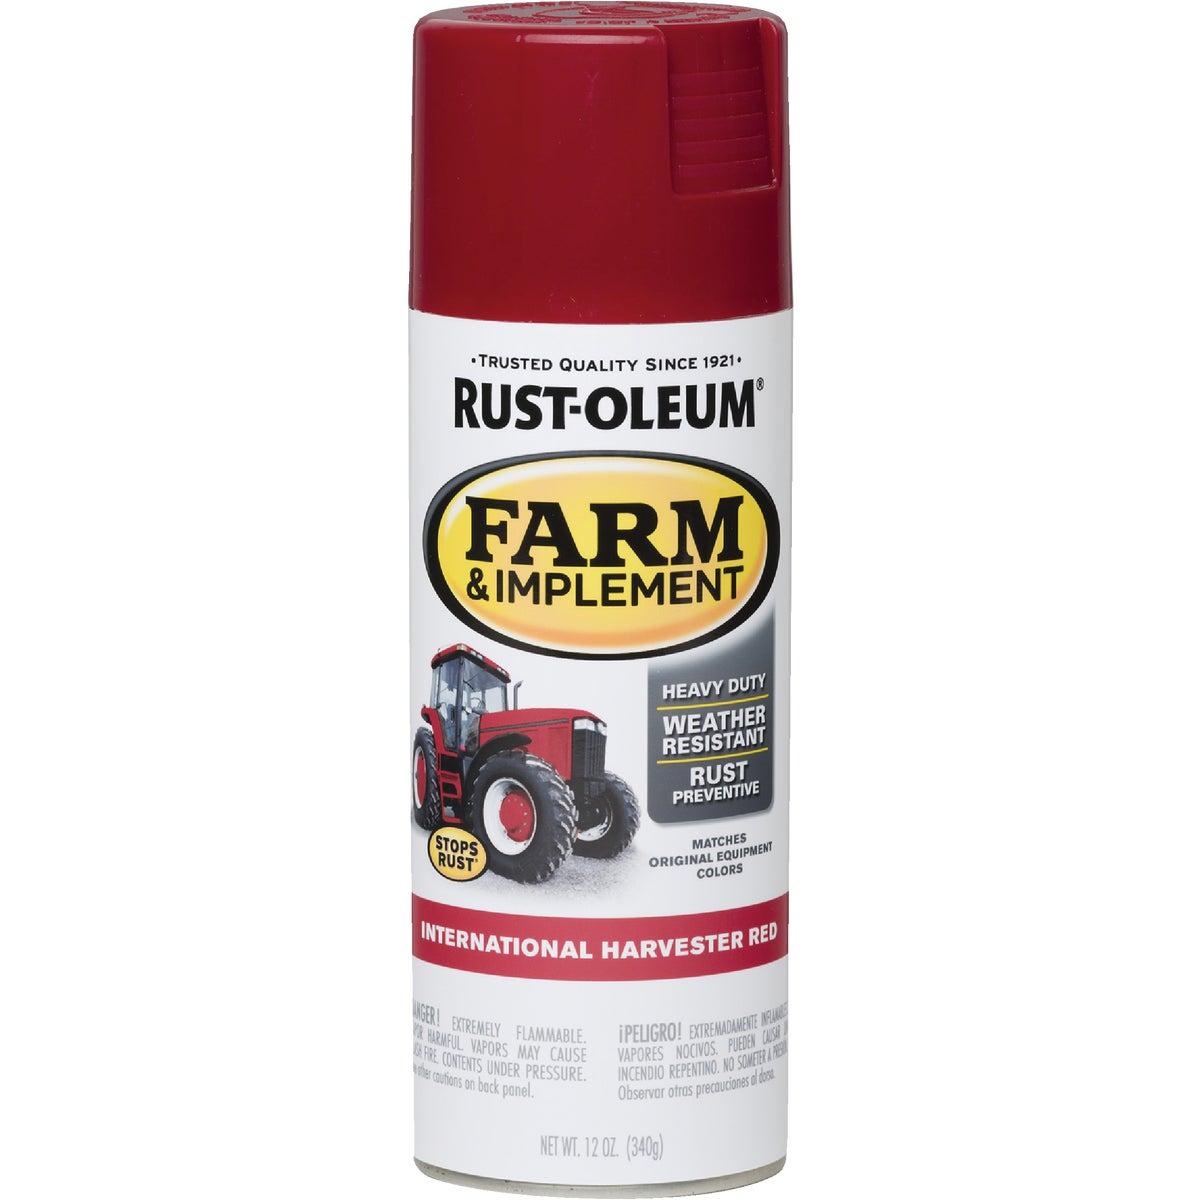 Rust Oleum INTL RED SPRAY PAINT 7466-830